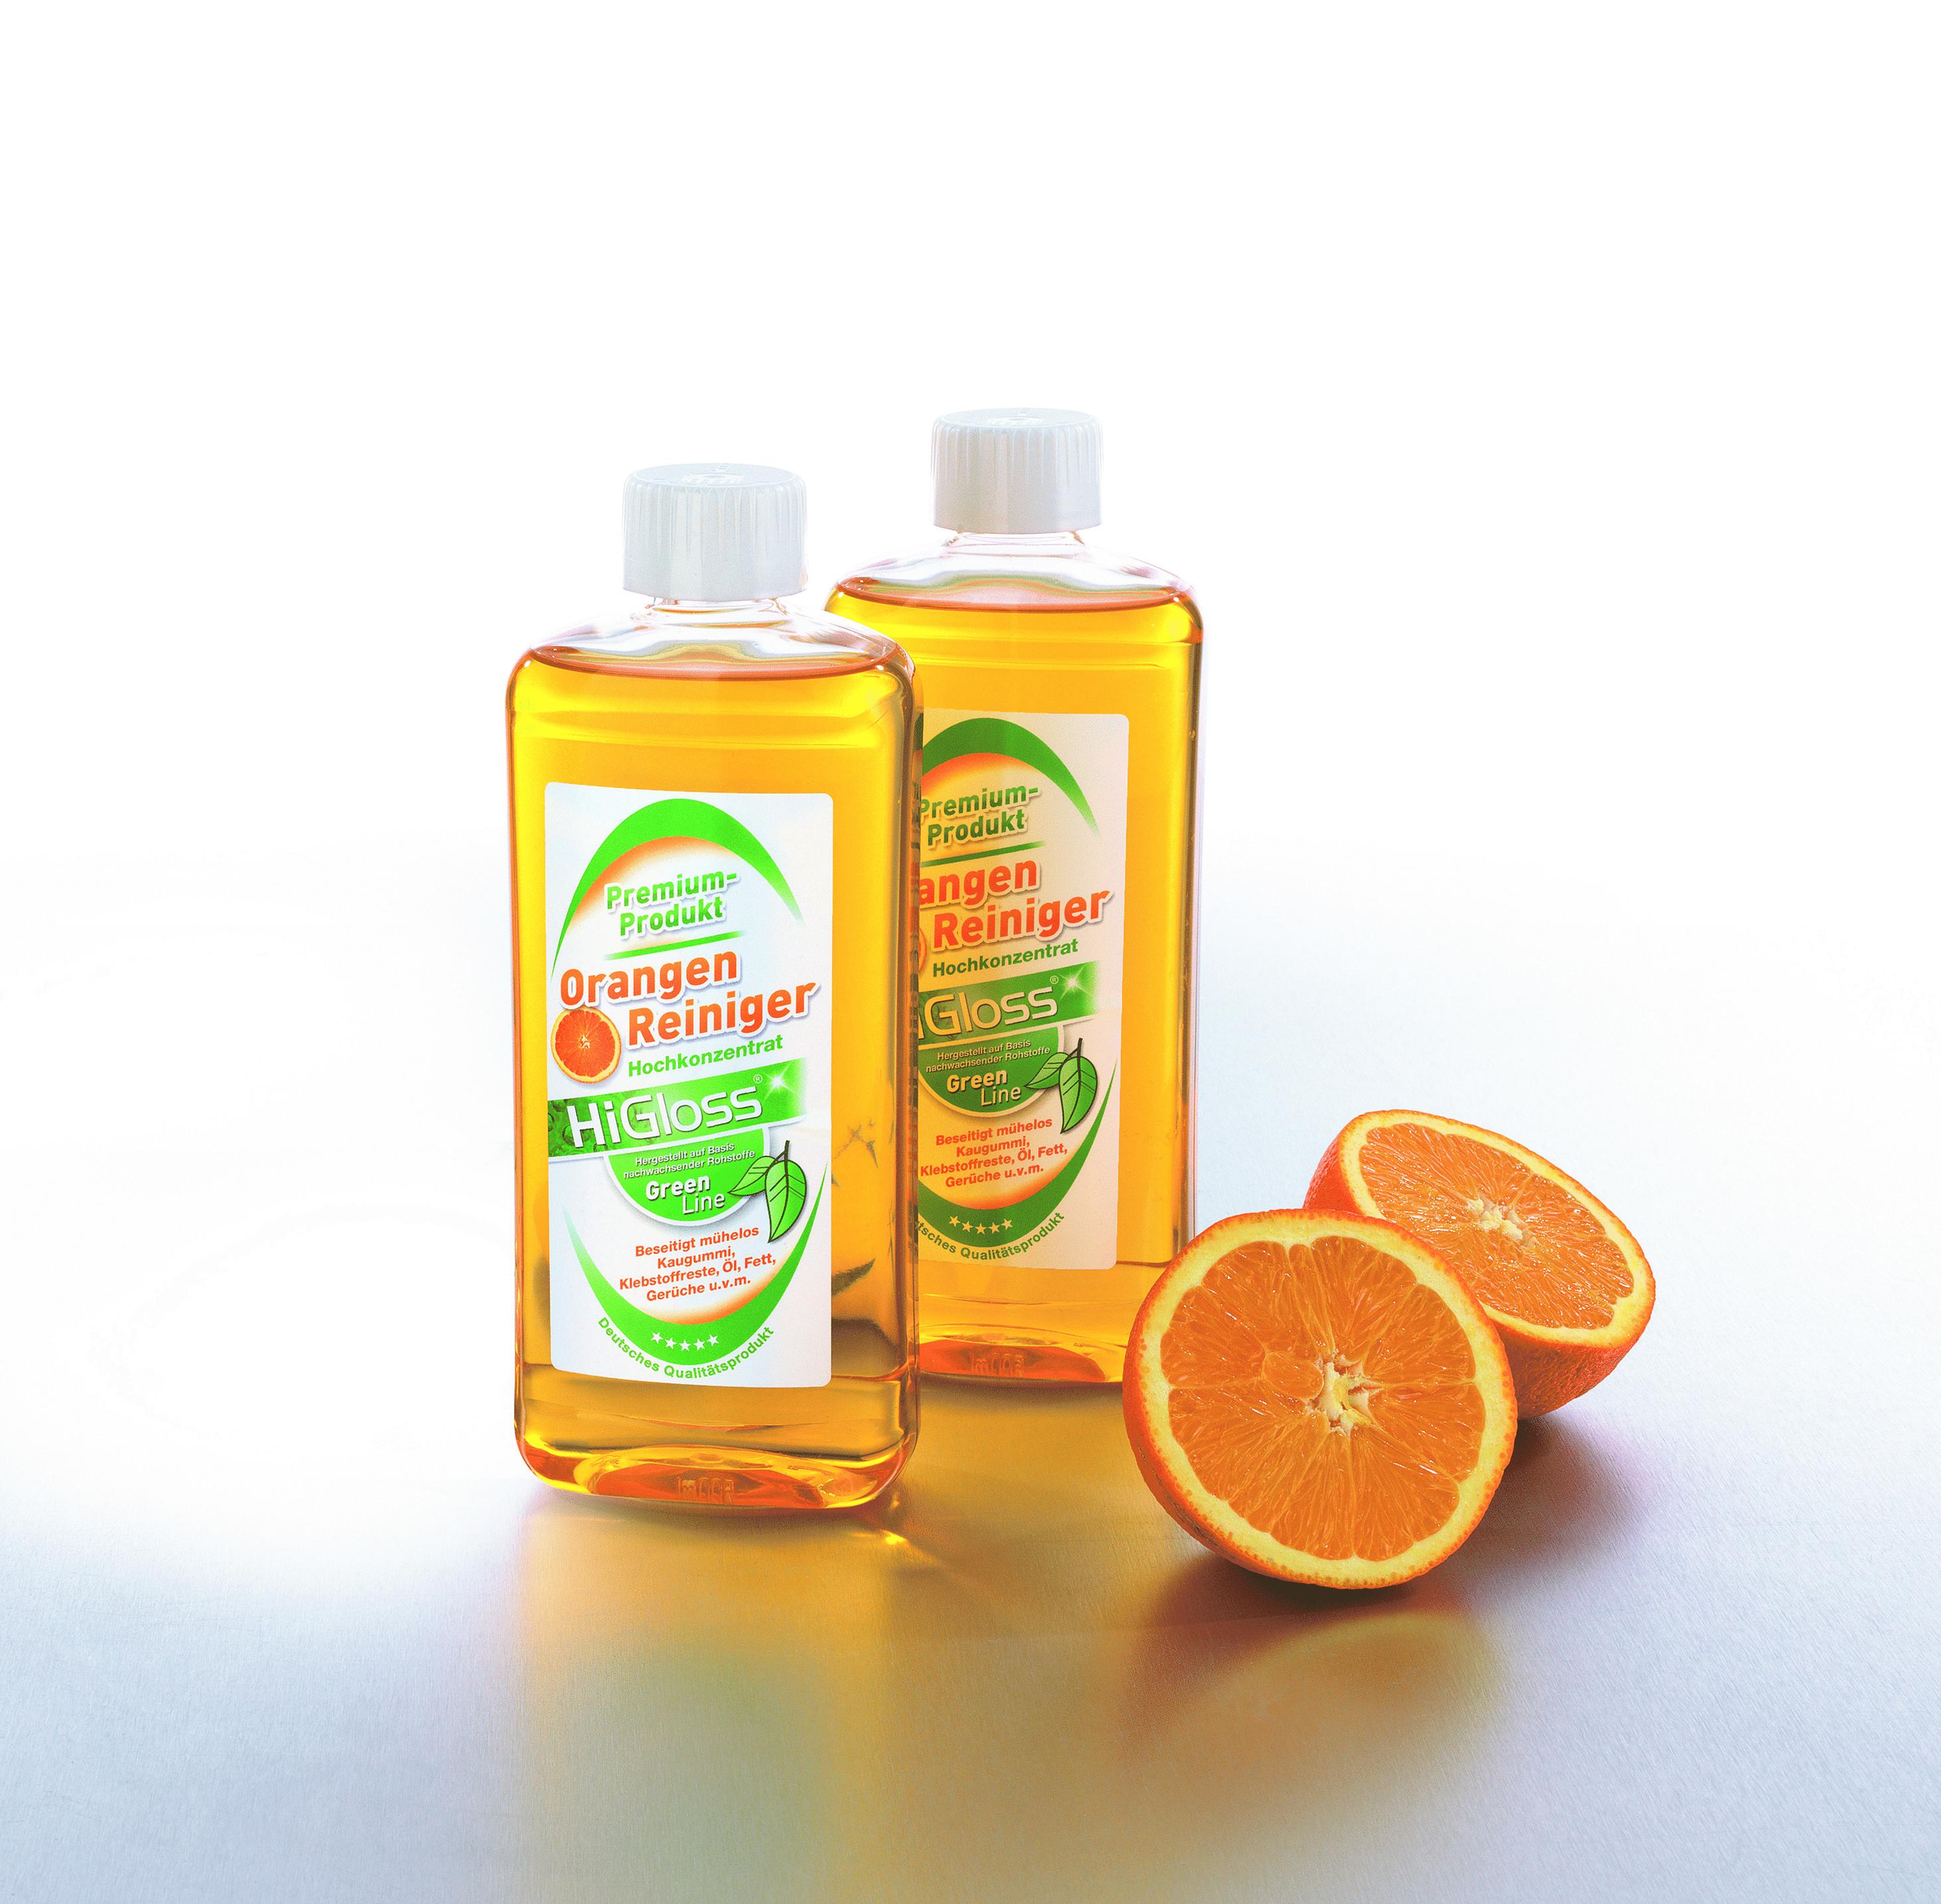 Orangensaft Apfelsaft Juicebox Clip-art - Apfel-Saft-Clipart png  herunterladen - 600*875 - Kostenlos transparent Bereich png Herunterladen.